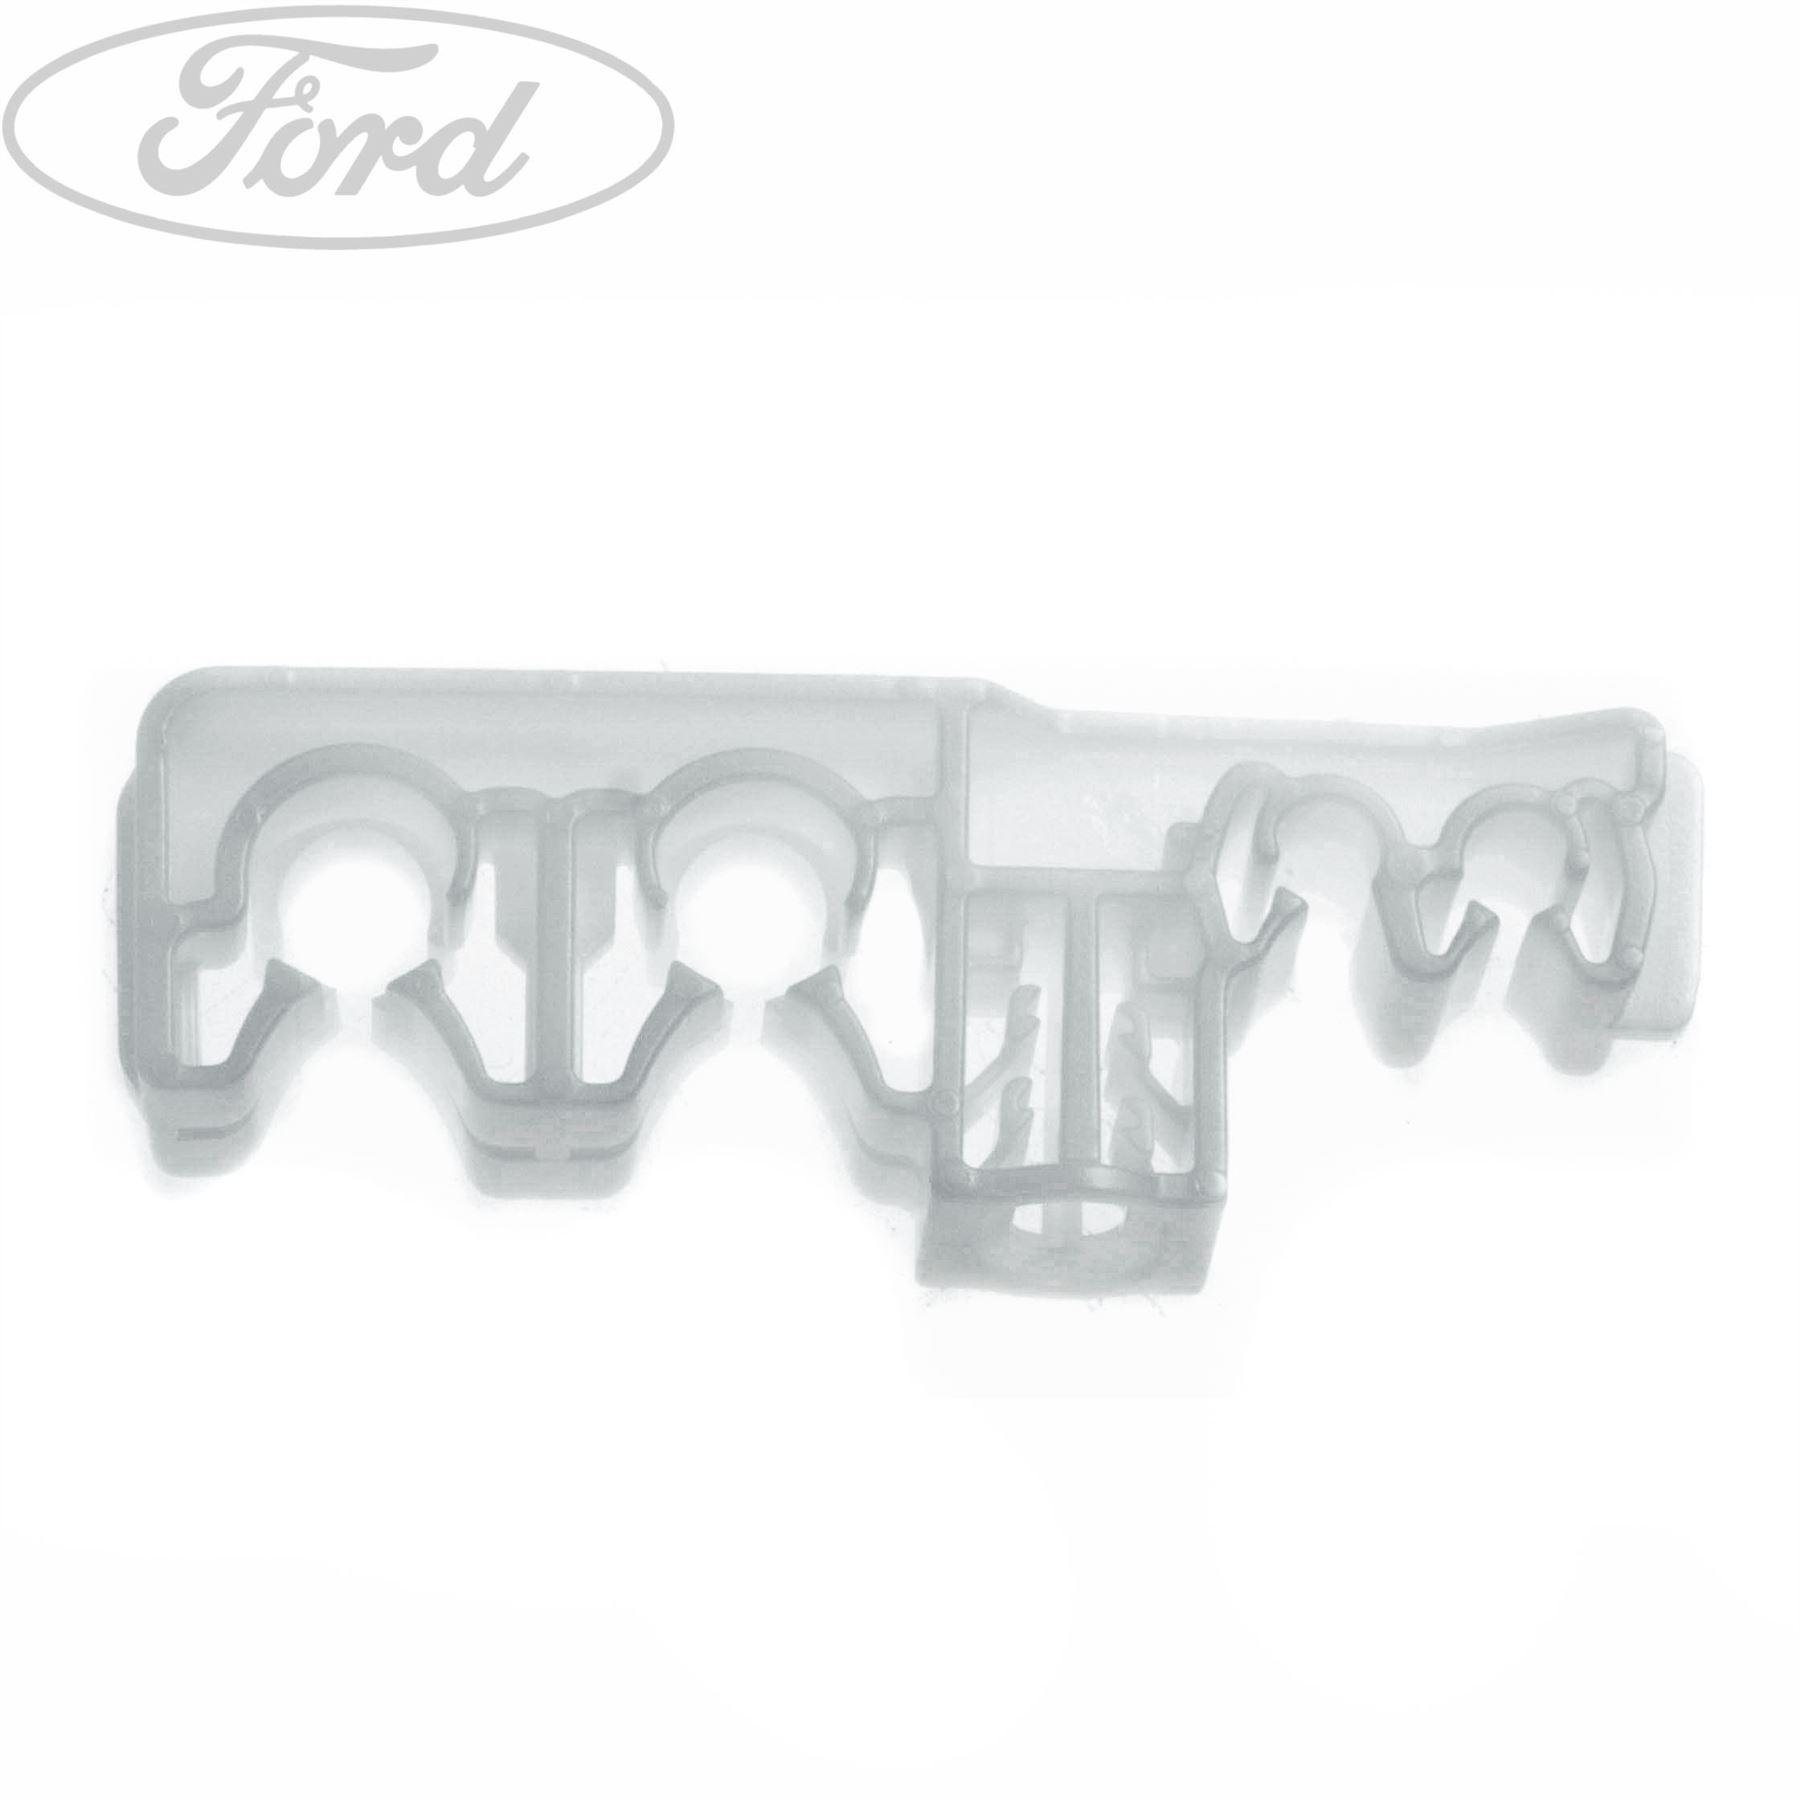 Genuine Ford Fiesta MK8 1.0 MK7 1.25 Petrol Fuel Line Clip 2008-Onwards 1559022